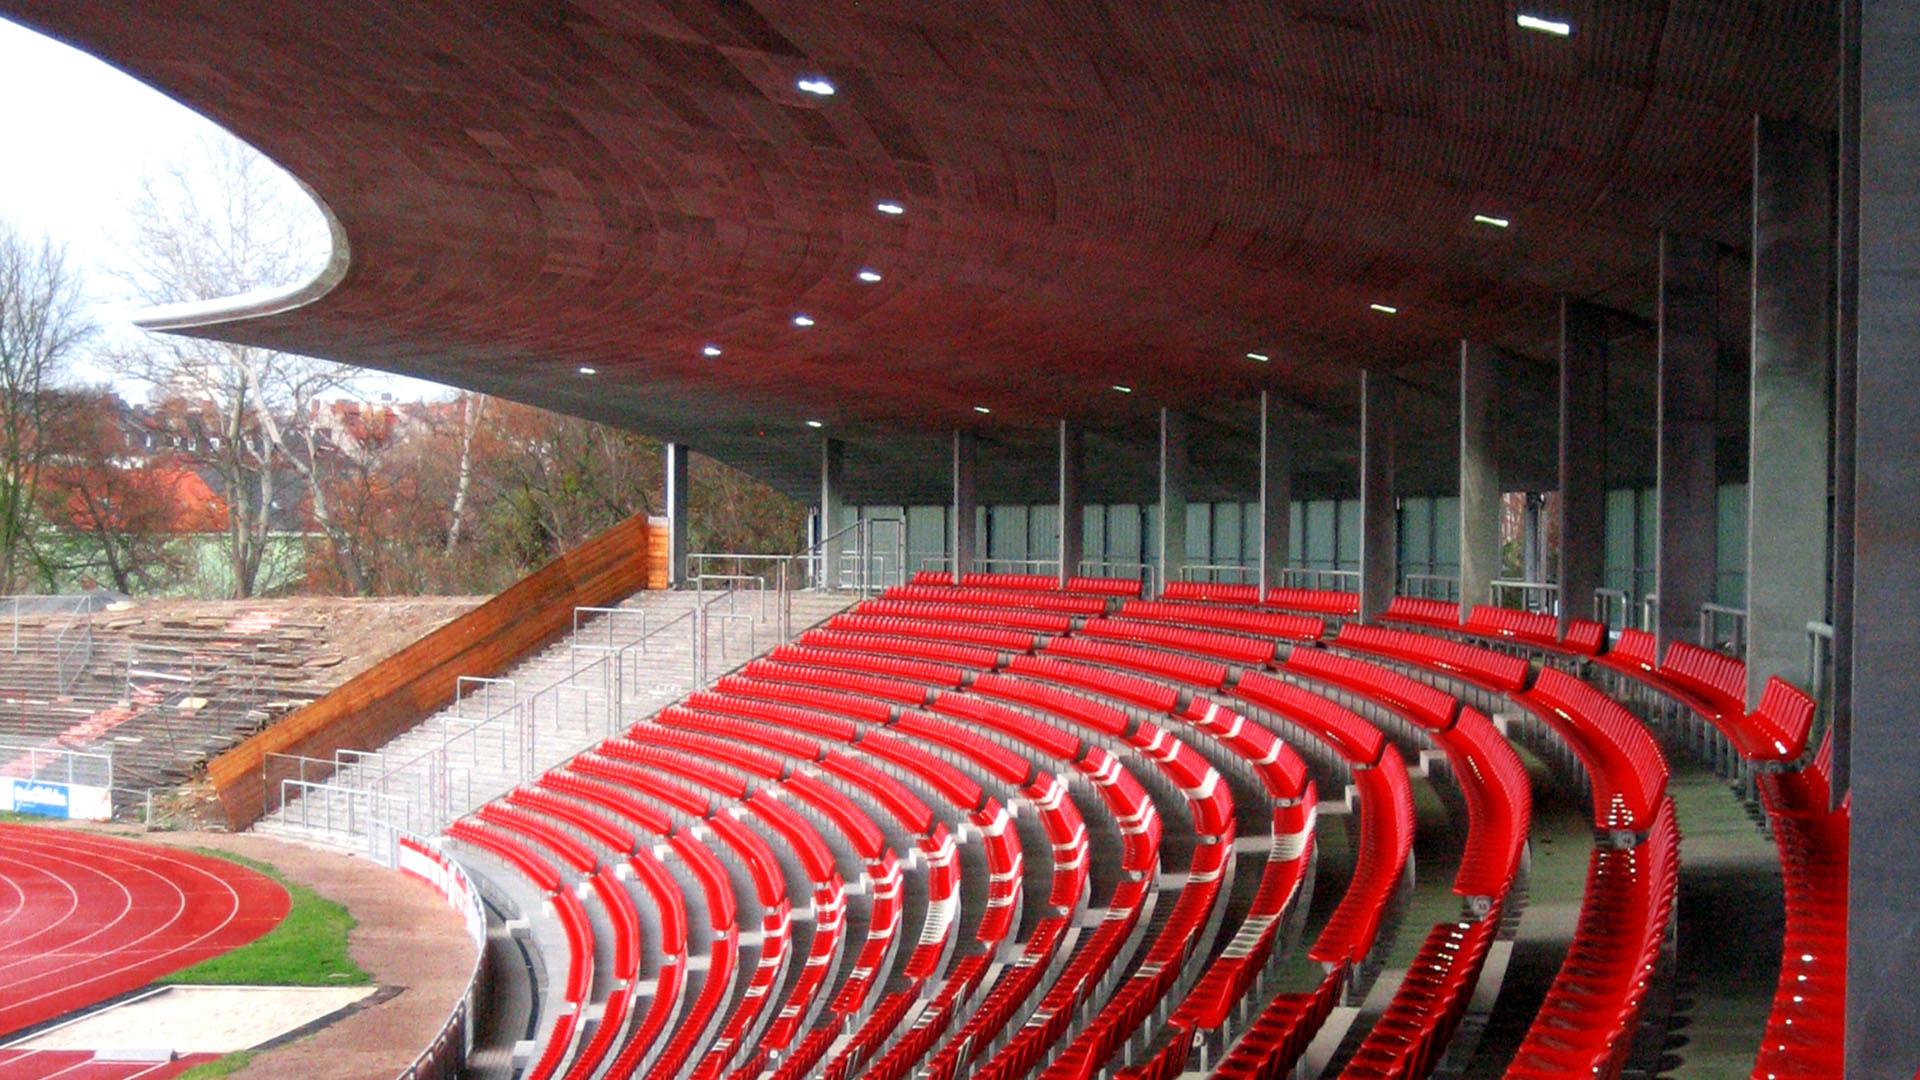 Lamparter Kassel Auestadion Stadion Kassel Osttribüne Stahlbau